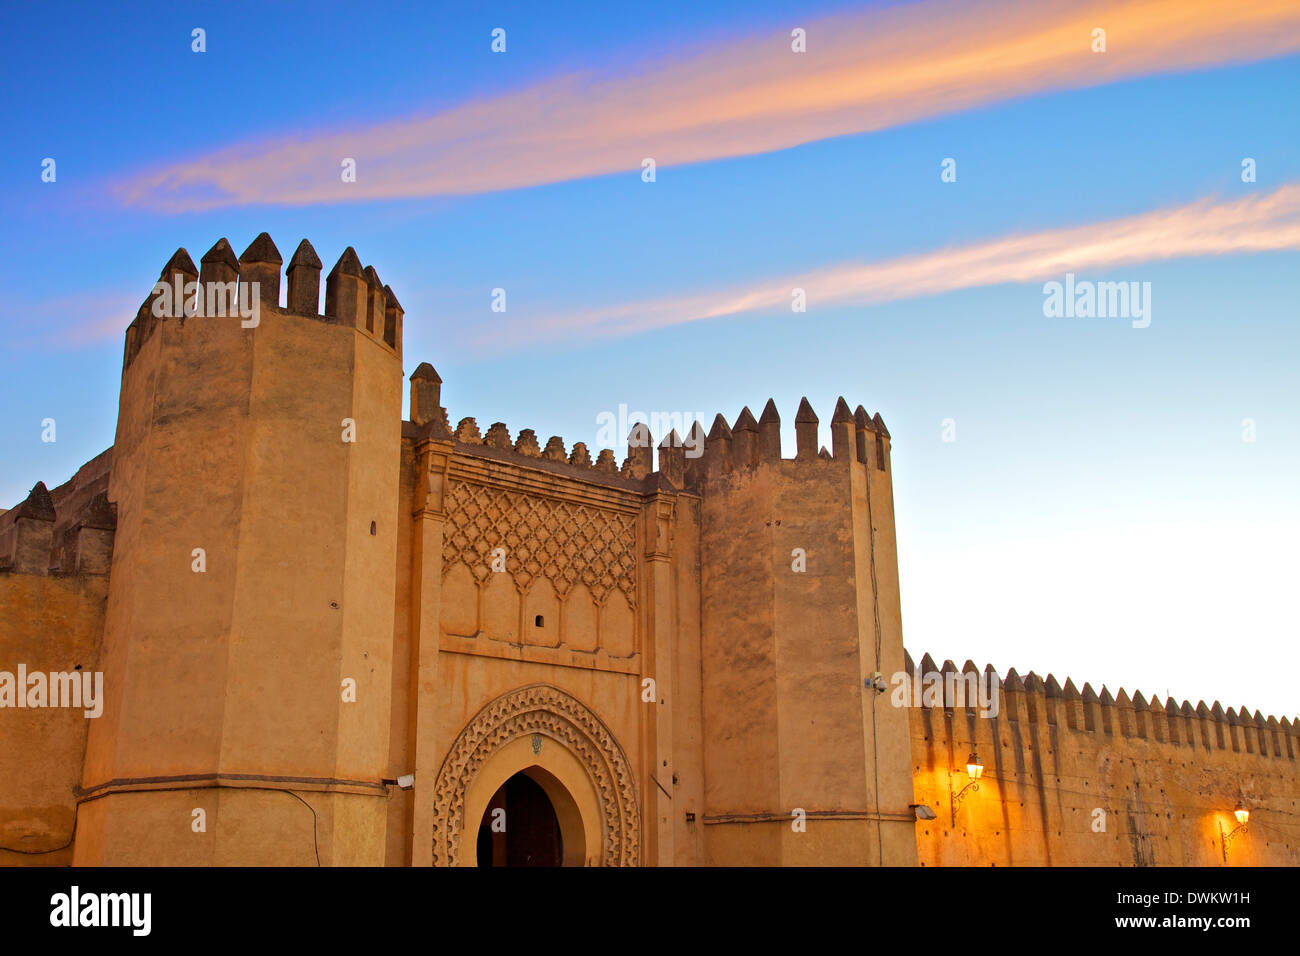 Posizionare Bou Jeloud, Fez, in Marocco, Africa Settentrionale, Africa Immagini Stock